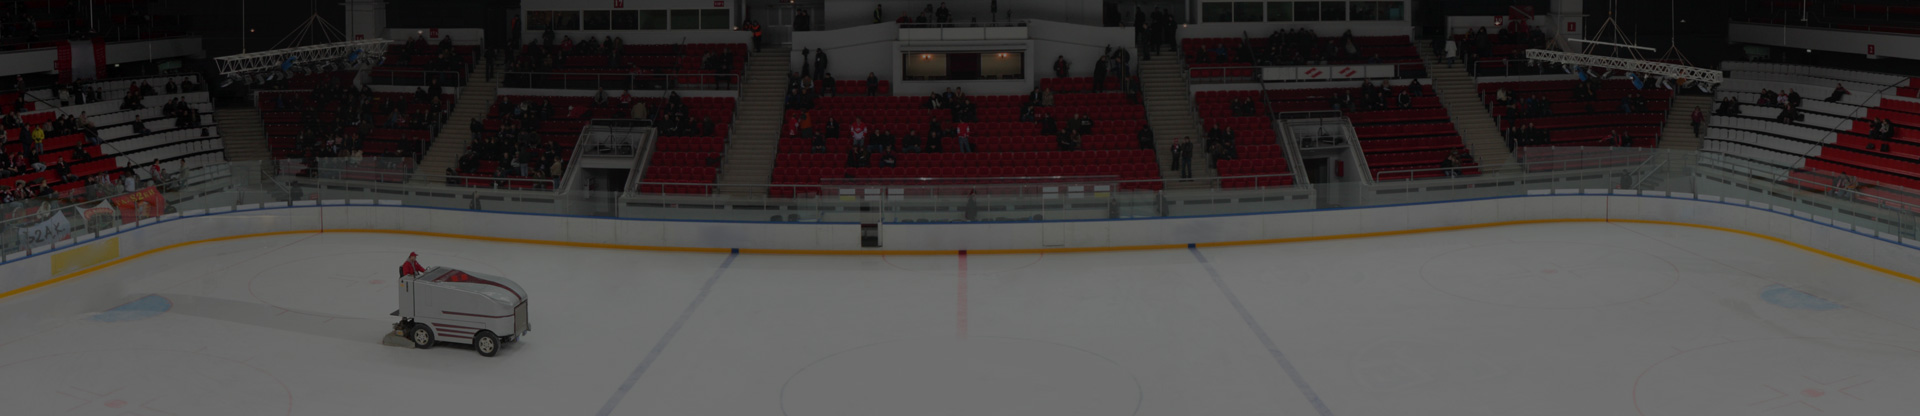 Hockey International Adult Hockey Tournaments